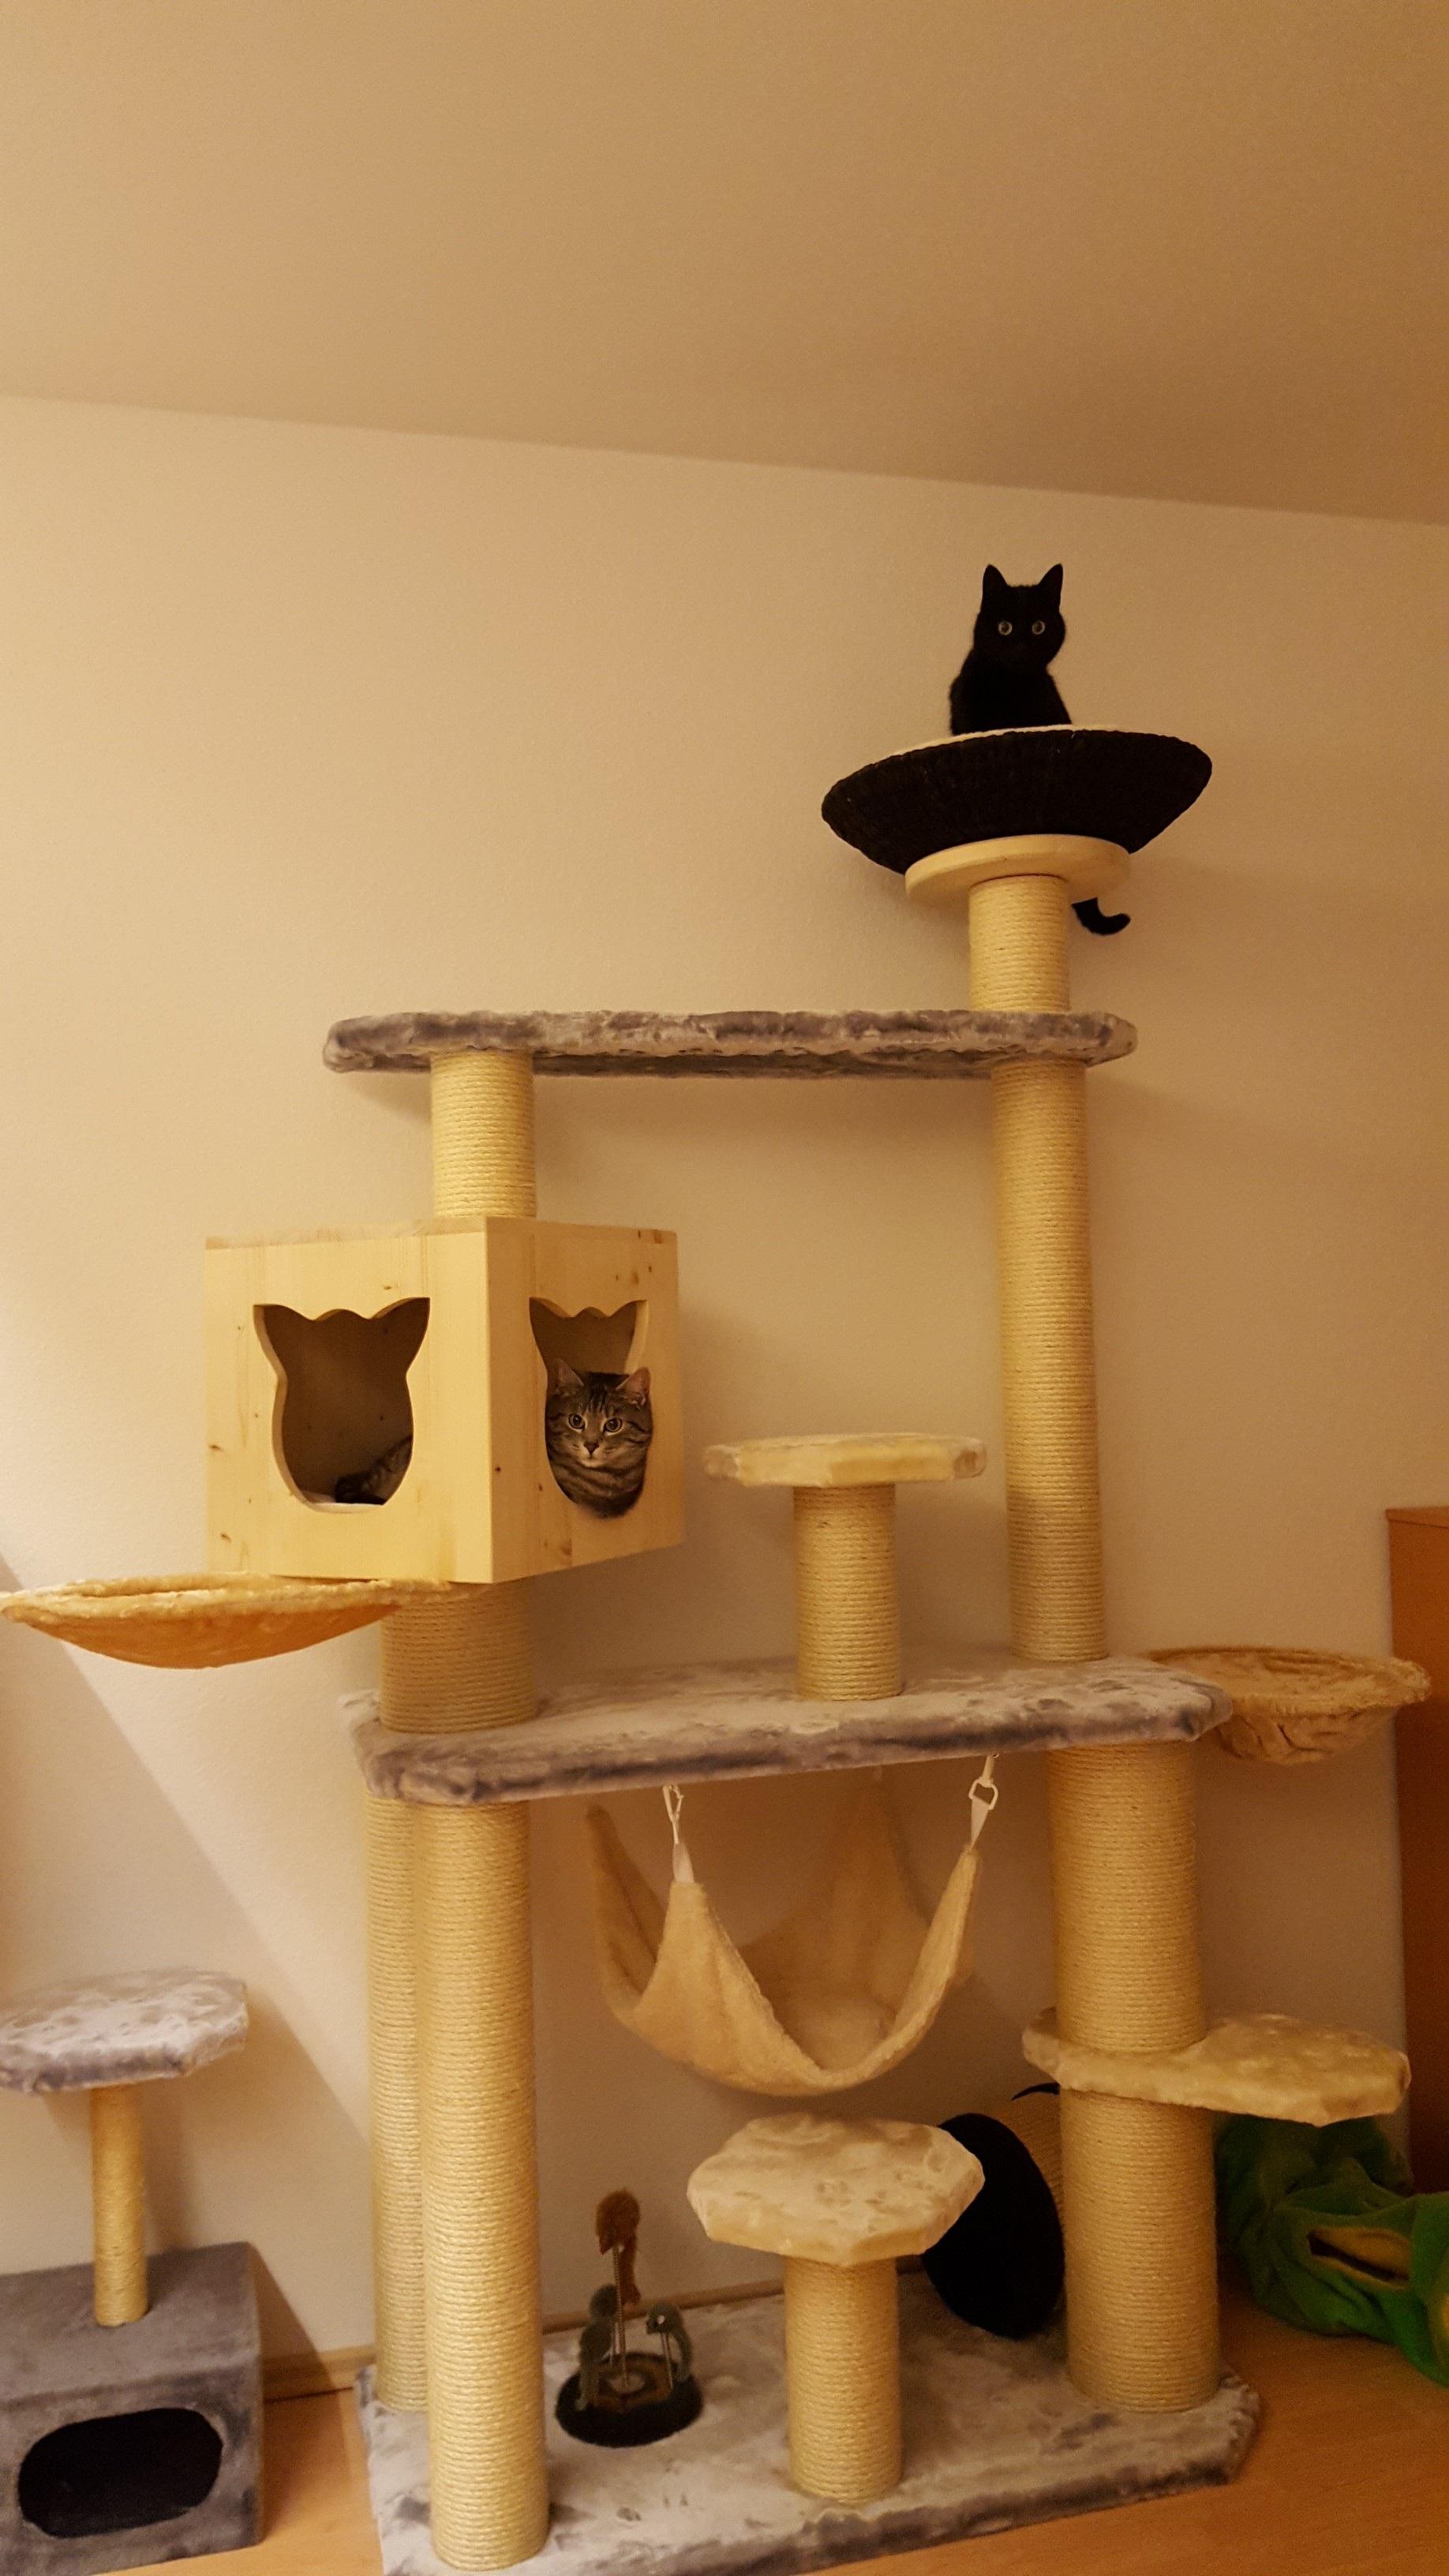 kratzbaum grosse katzen massiv stabil rassekatzen. Black Bedroom Furniture Sets. Home Design Ideas